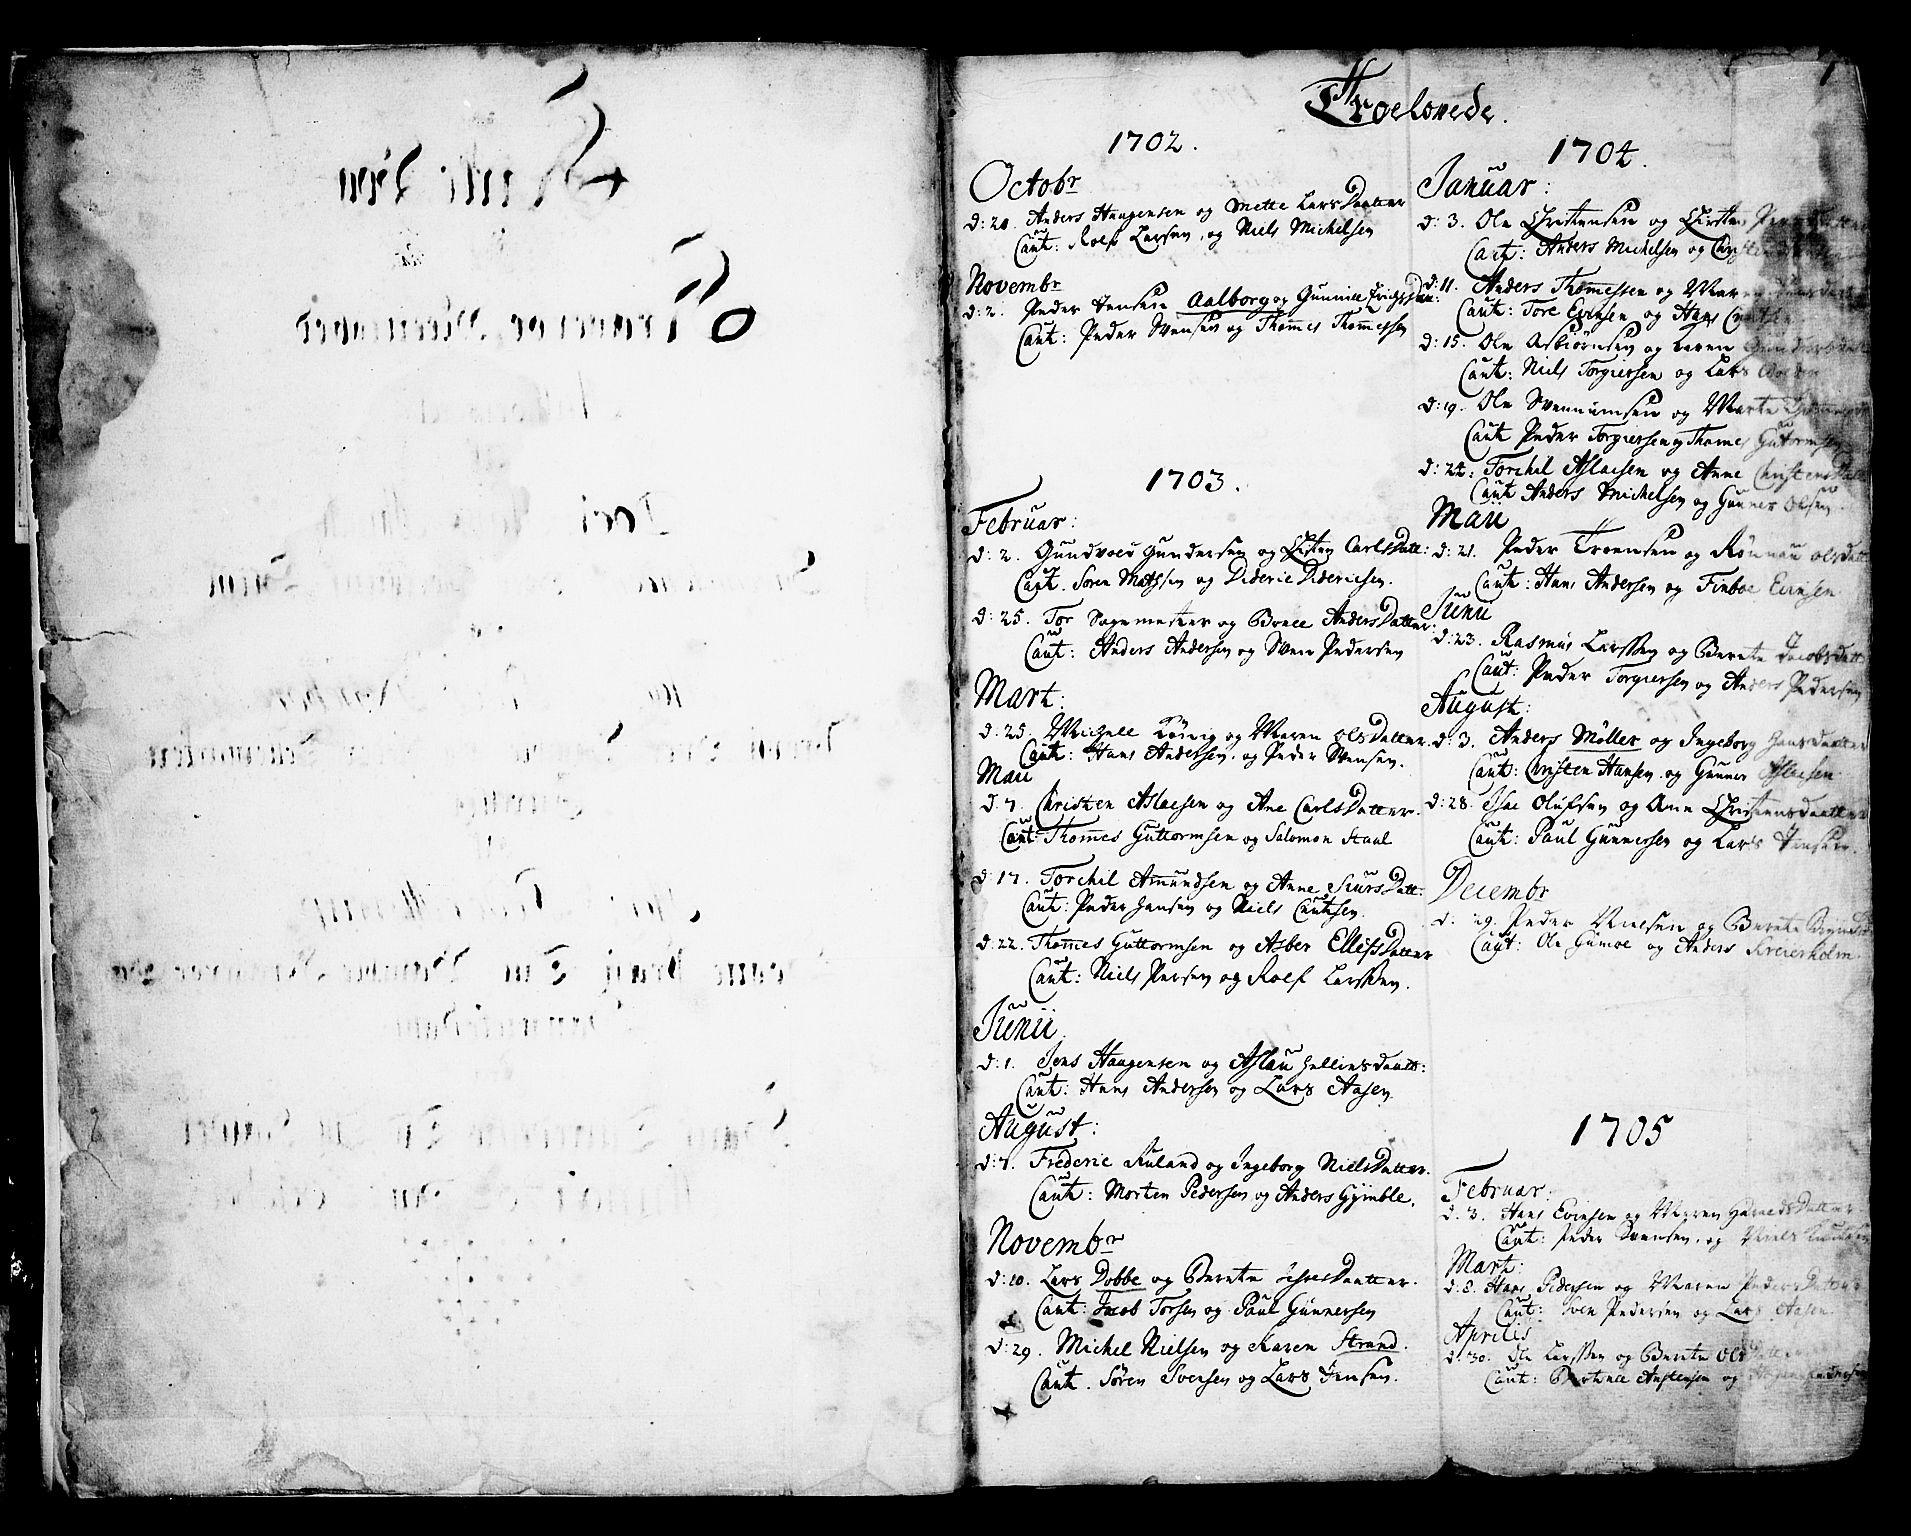 SAKO, Kragerø kirkebøker, F/Fa/L0001: Ministerialbok nr. 1, 1702-1766, s. 0-1